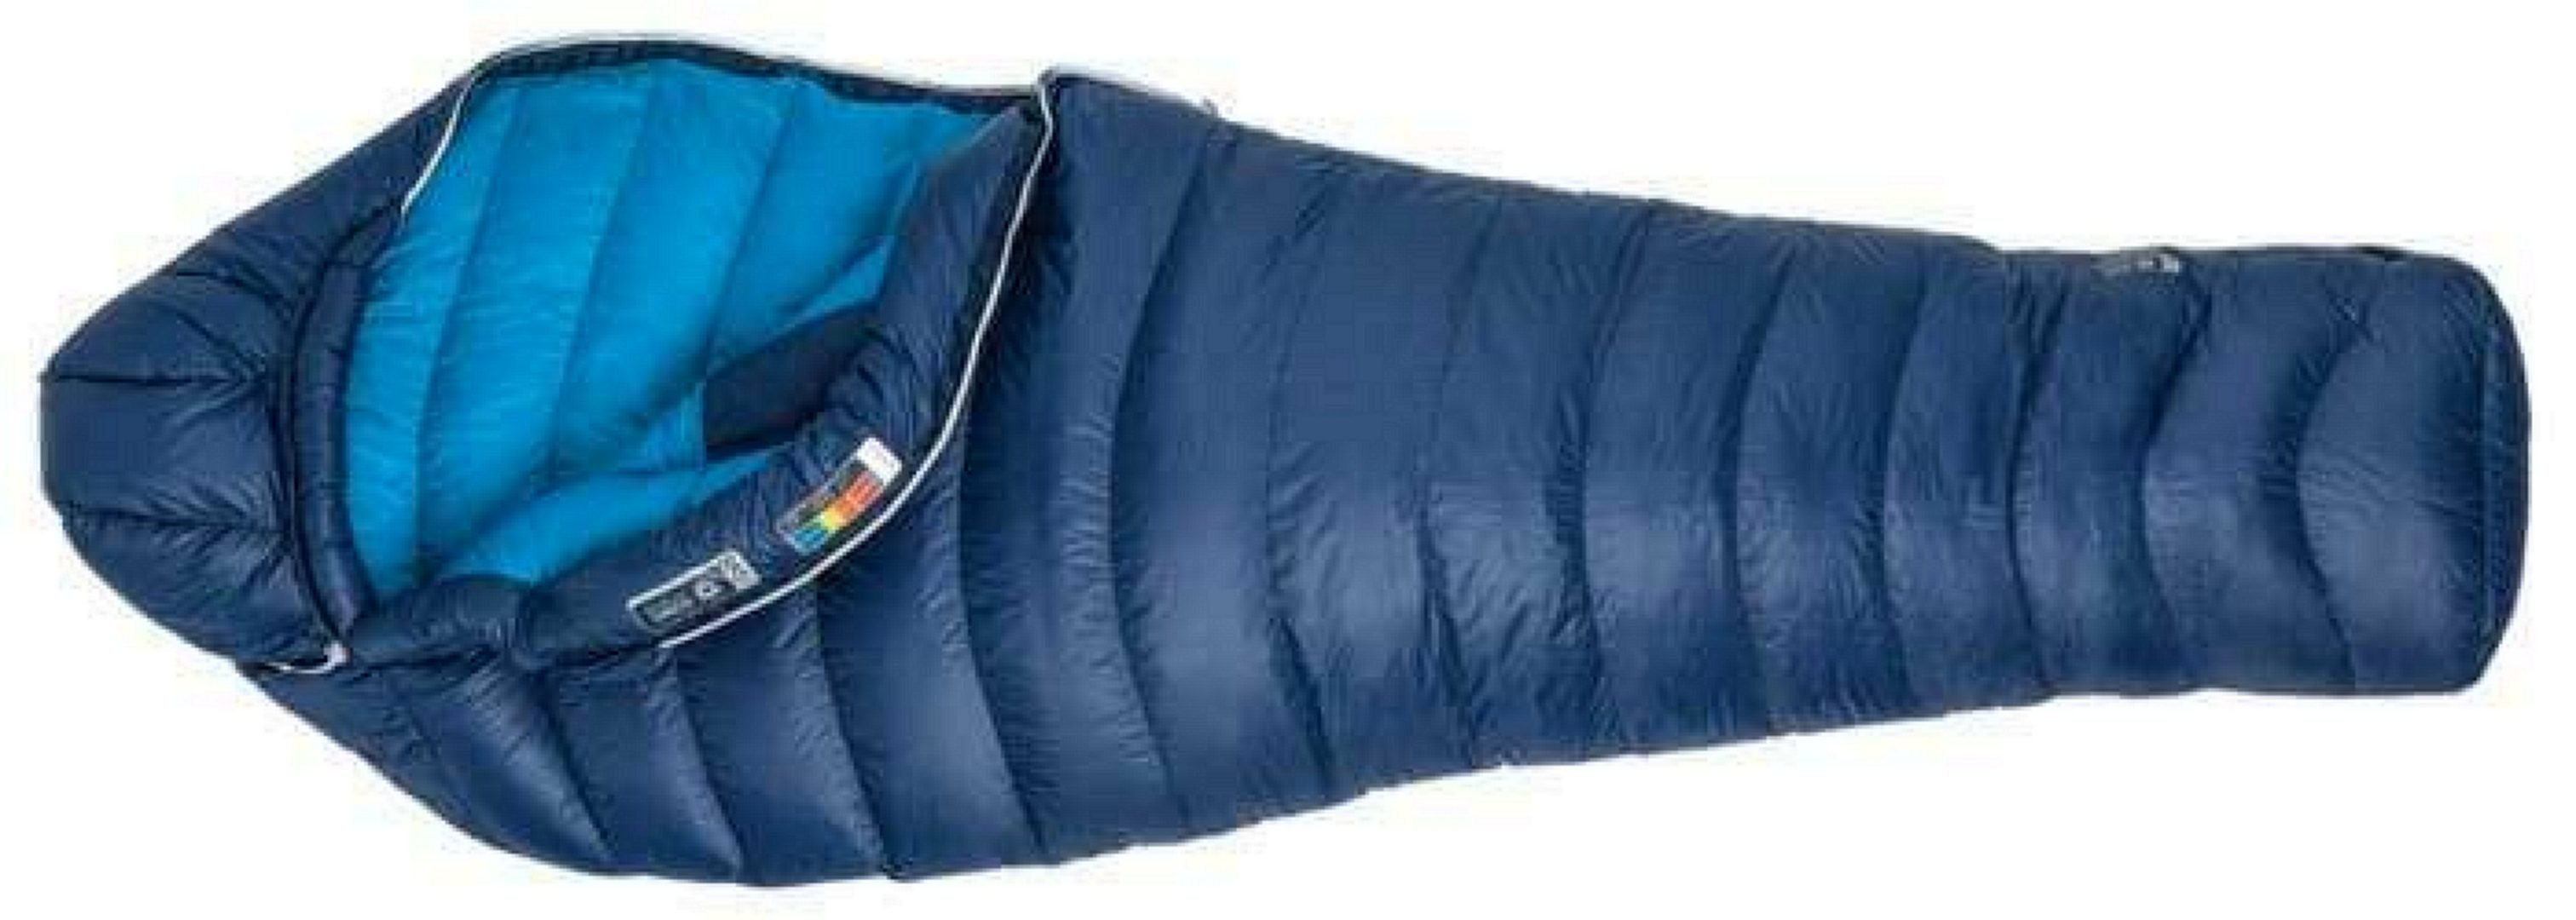 Marmot Phase Sleeping Bag